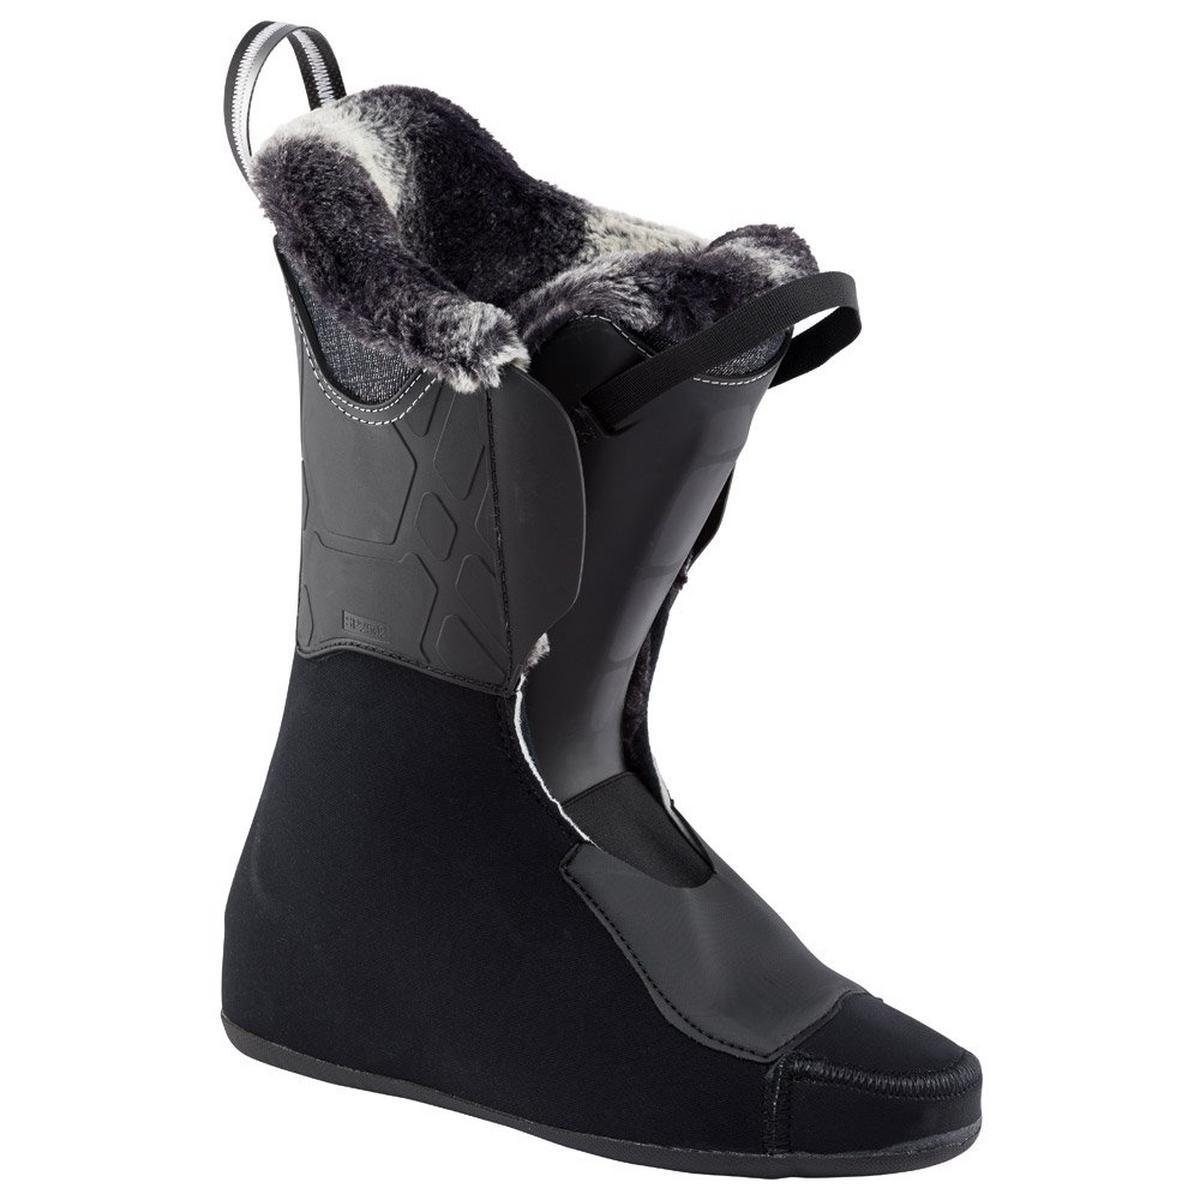 Rossignol Women's Pure Elite 70 Ski Boot - Black